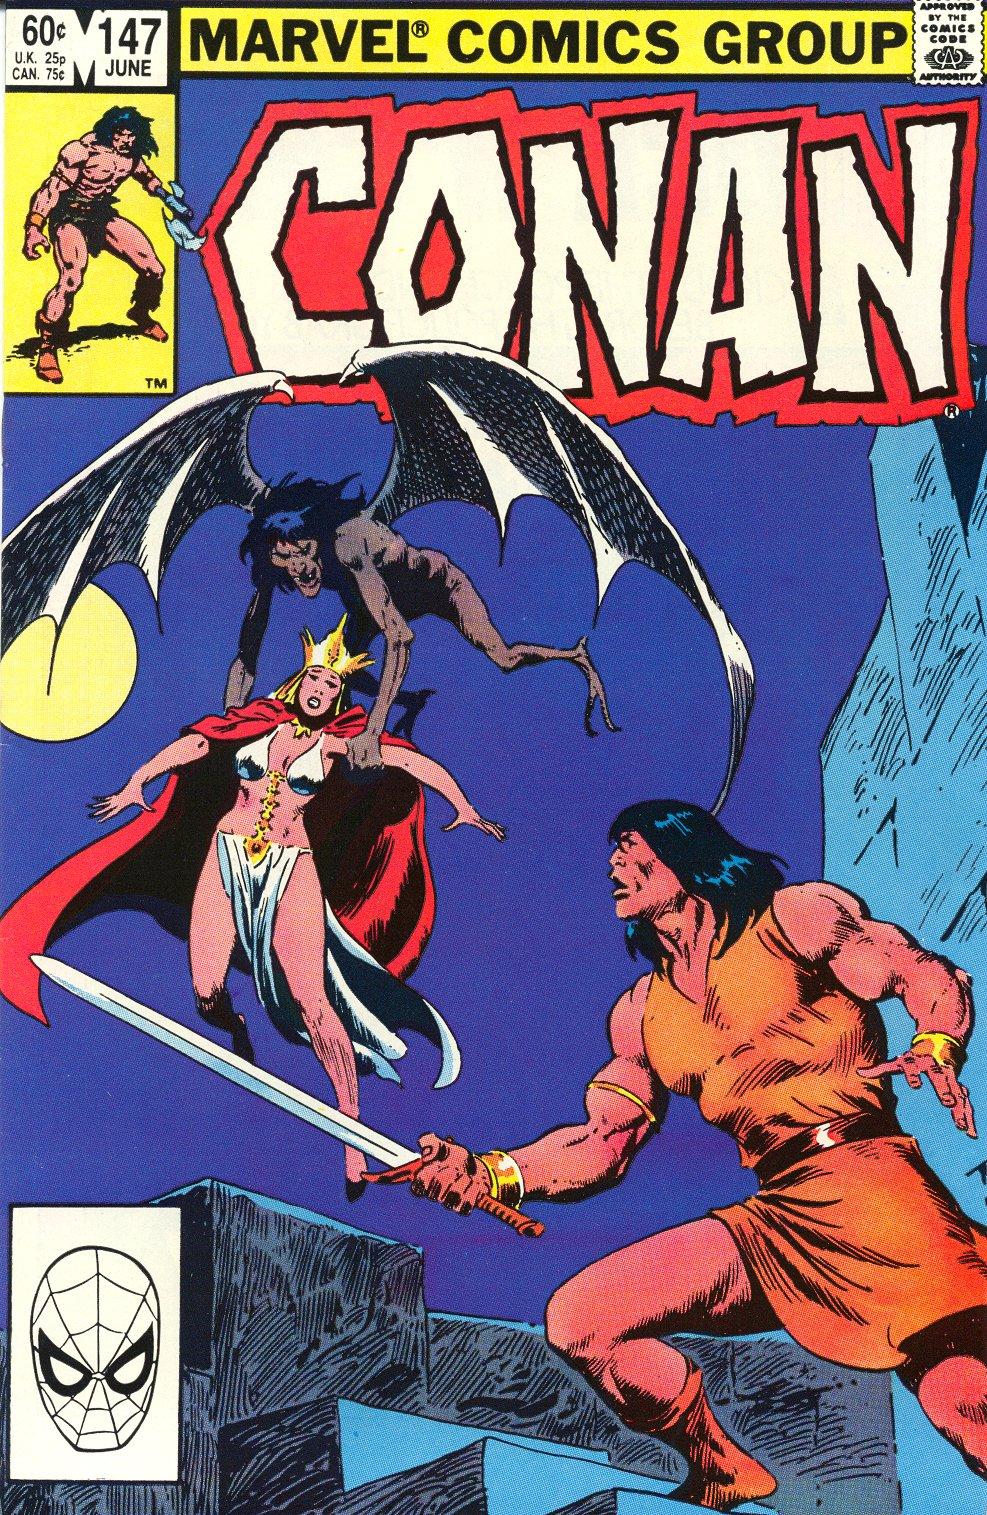 Conan the Barbarian 147